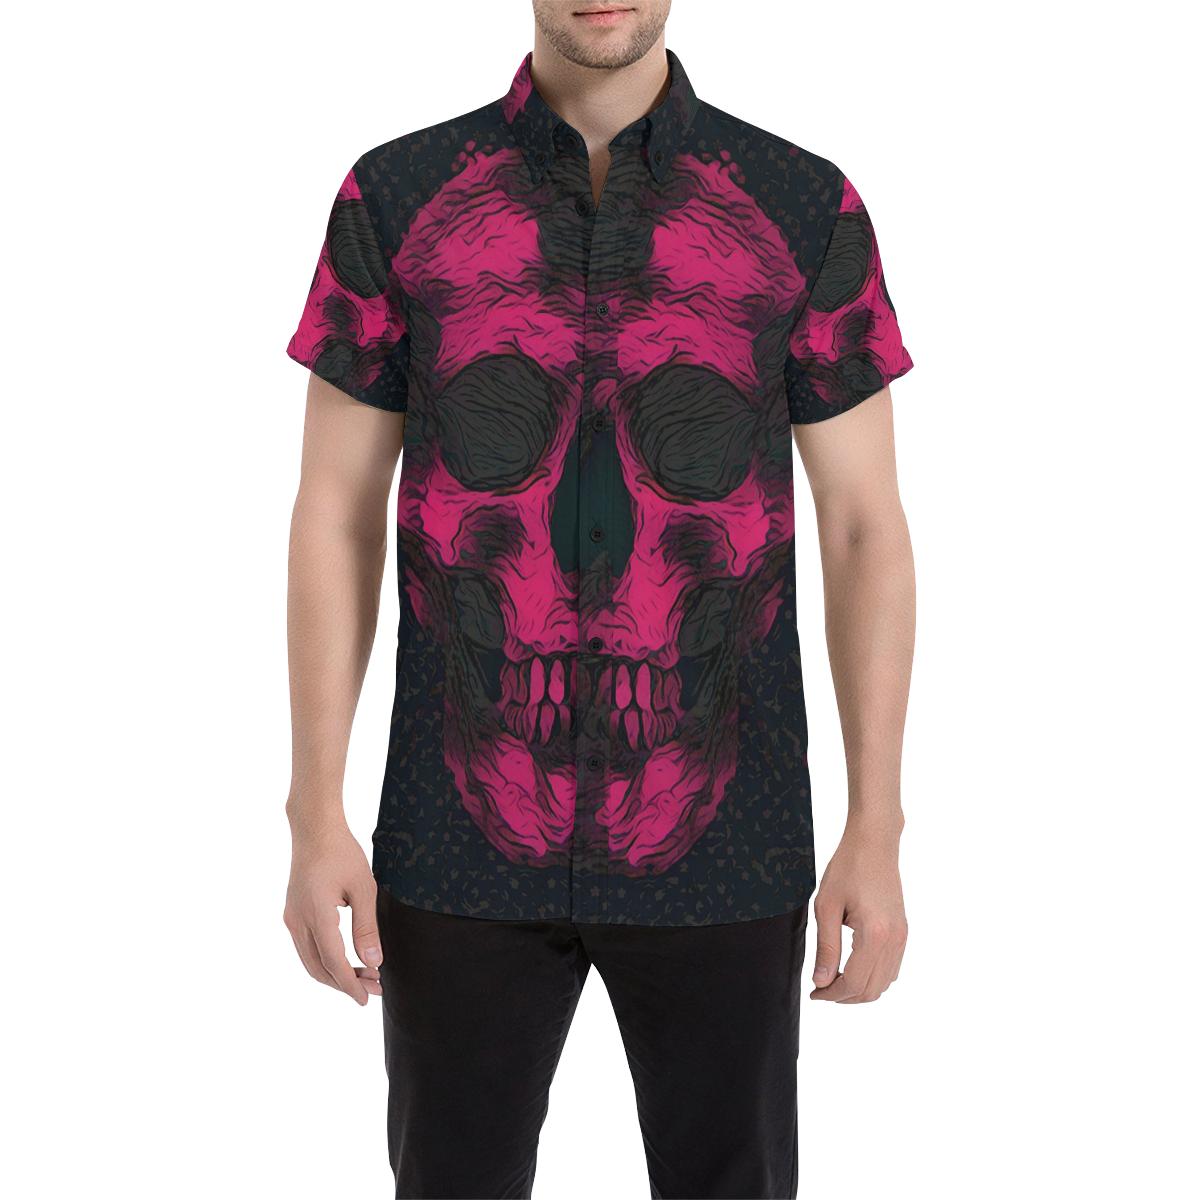 SKULL PINK ON BLACK ABSTRACT Men's All Over Print Short Sleeve Shirt (Model T53)